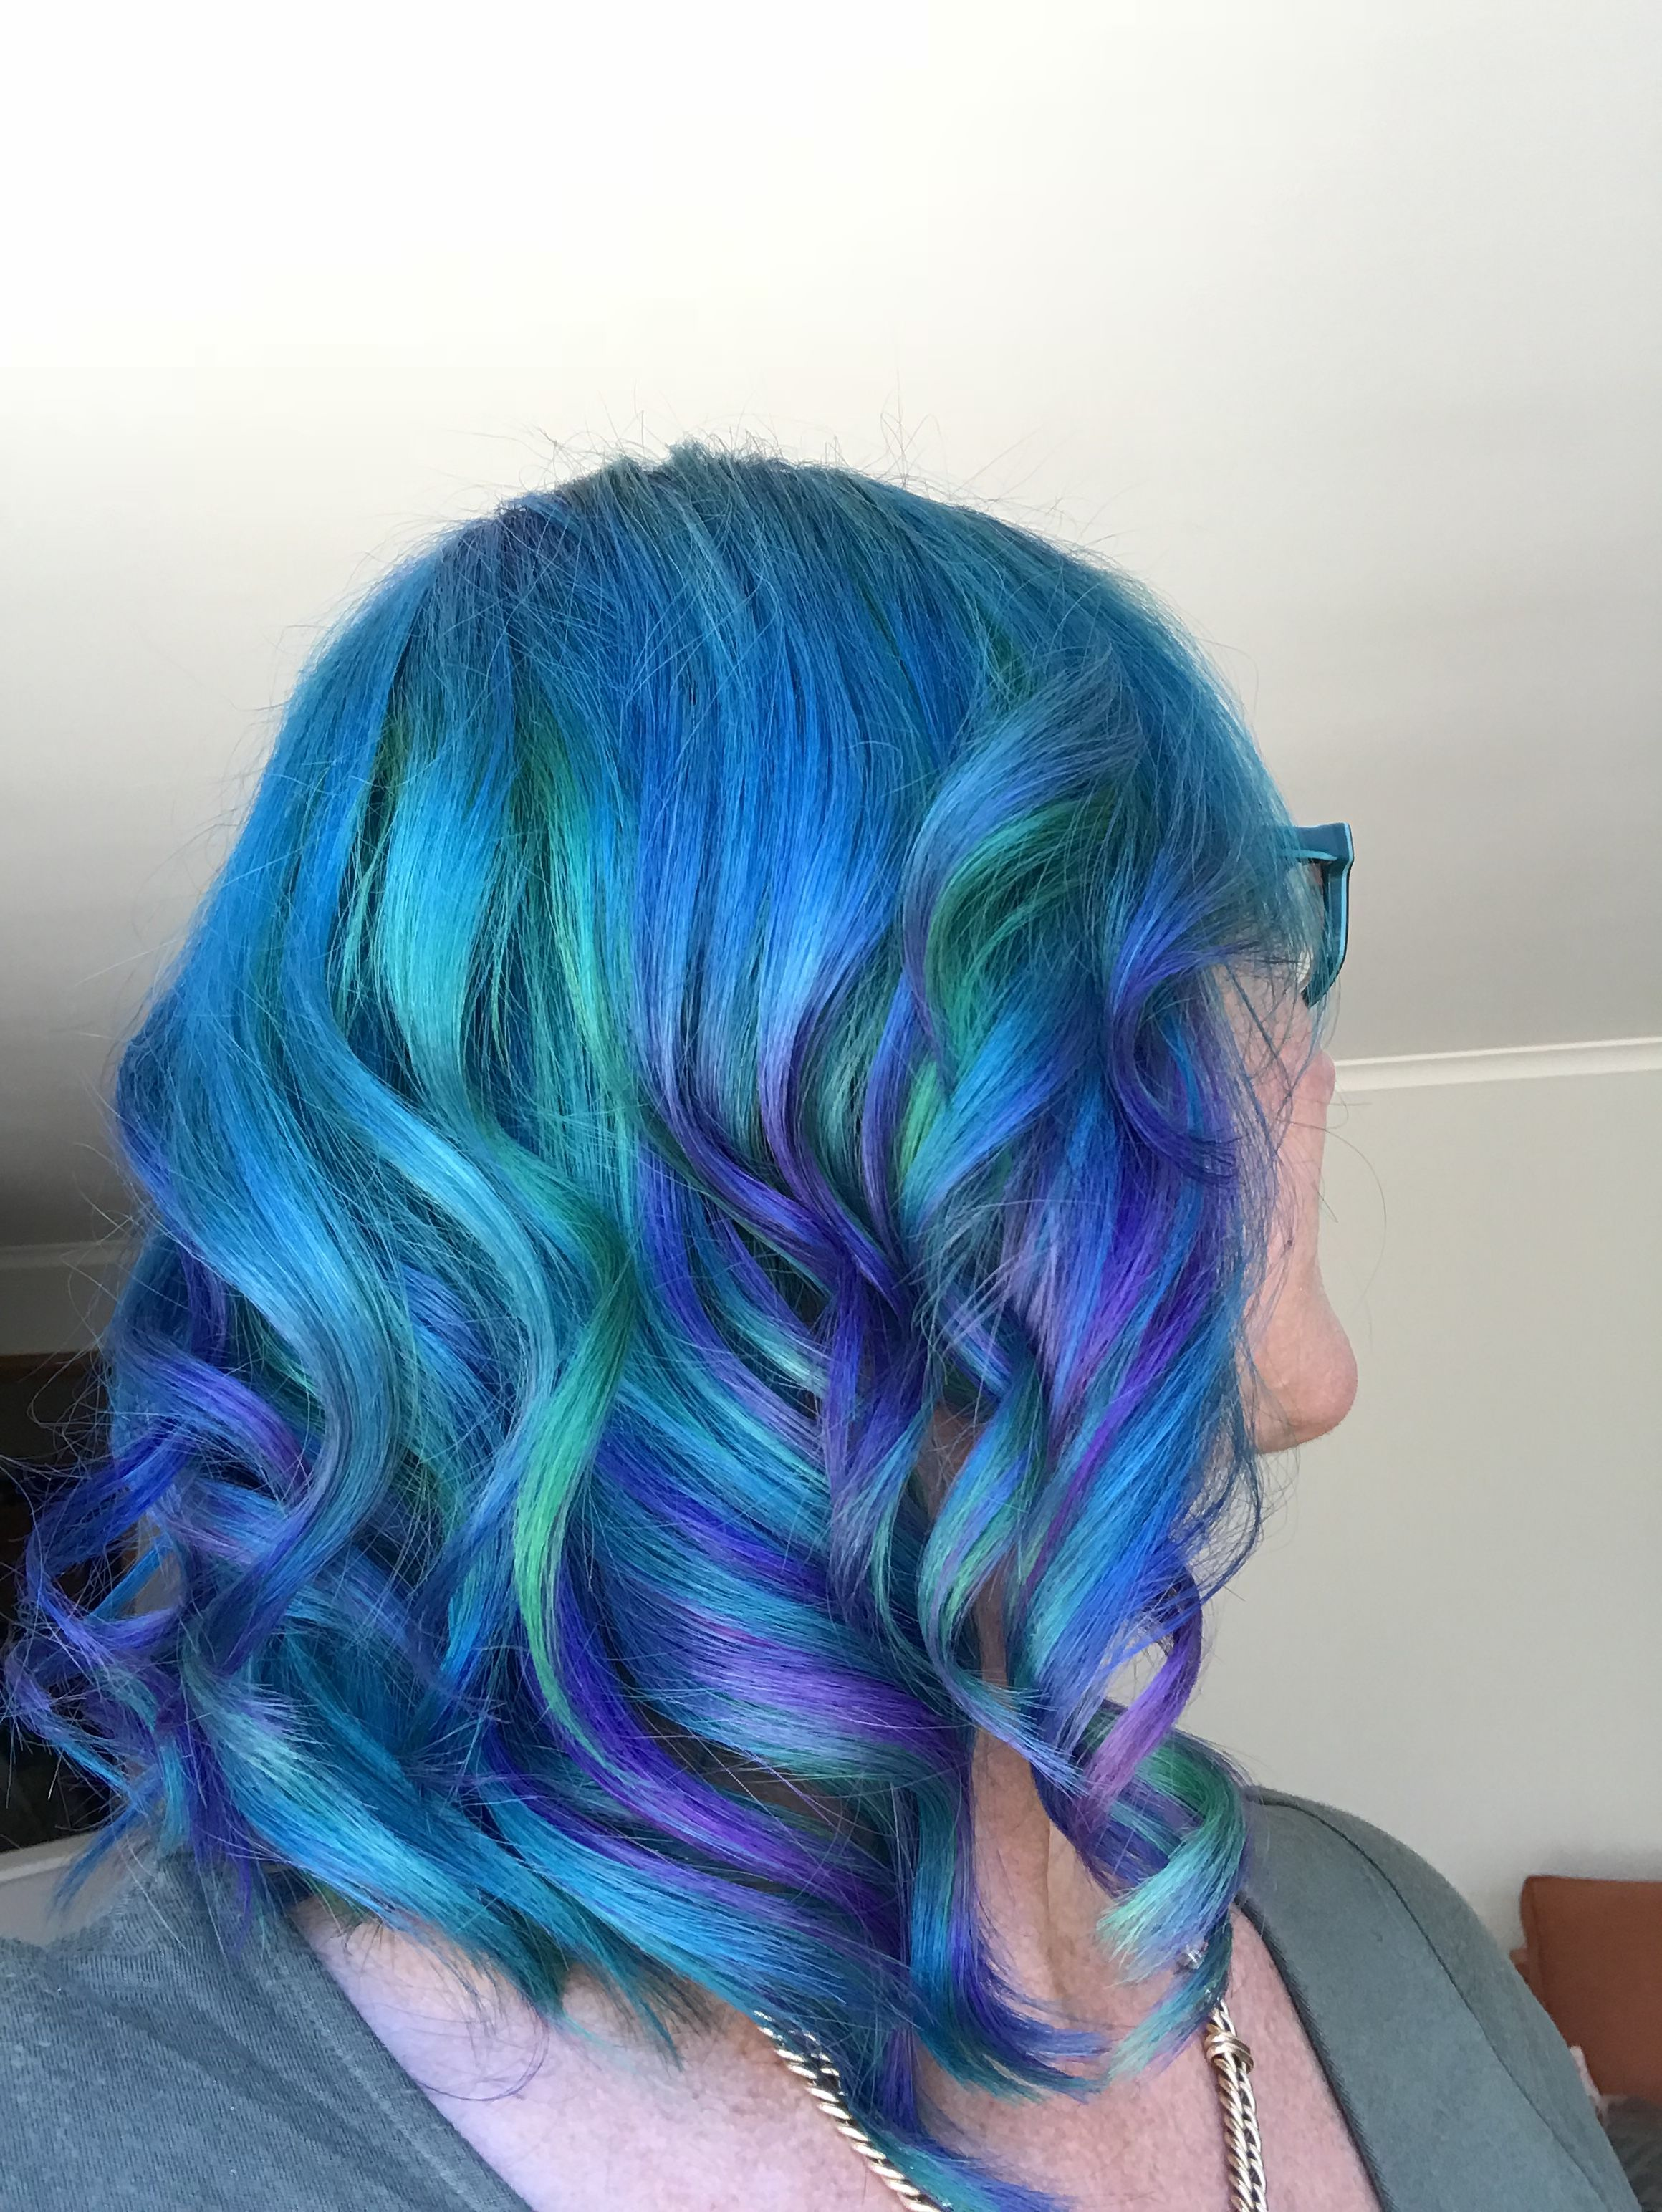 Arctic Fox Blue Hair Dye Aquamarine Poseidon Iris Purple Rain Handpainted